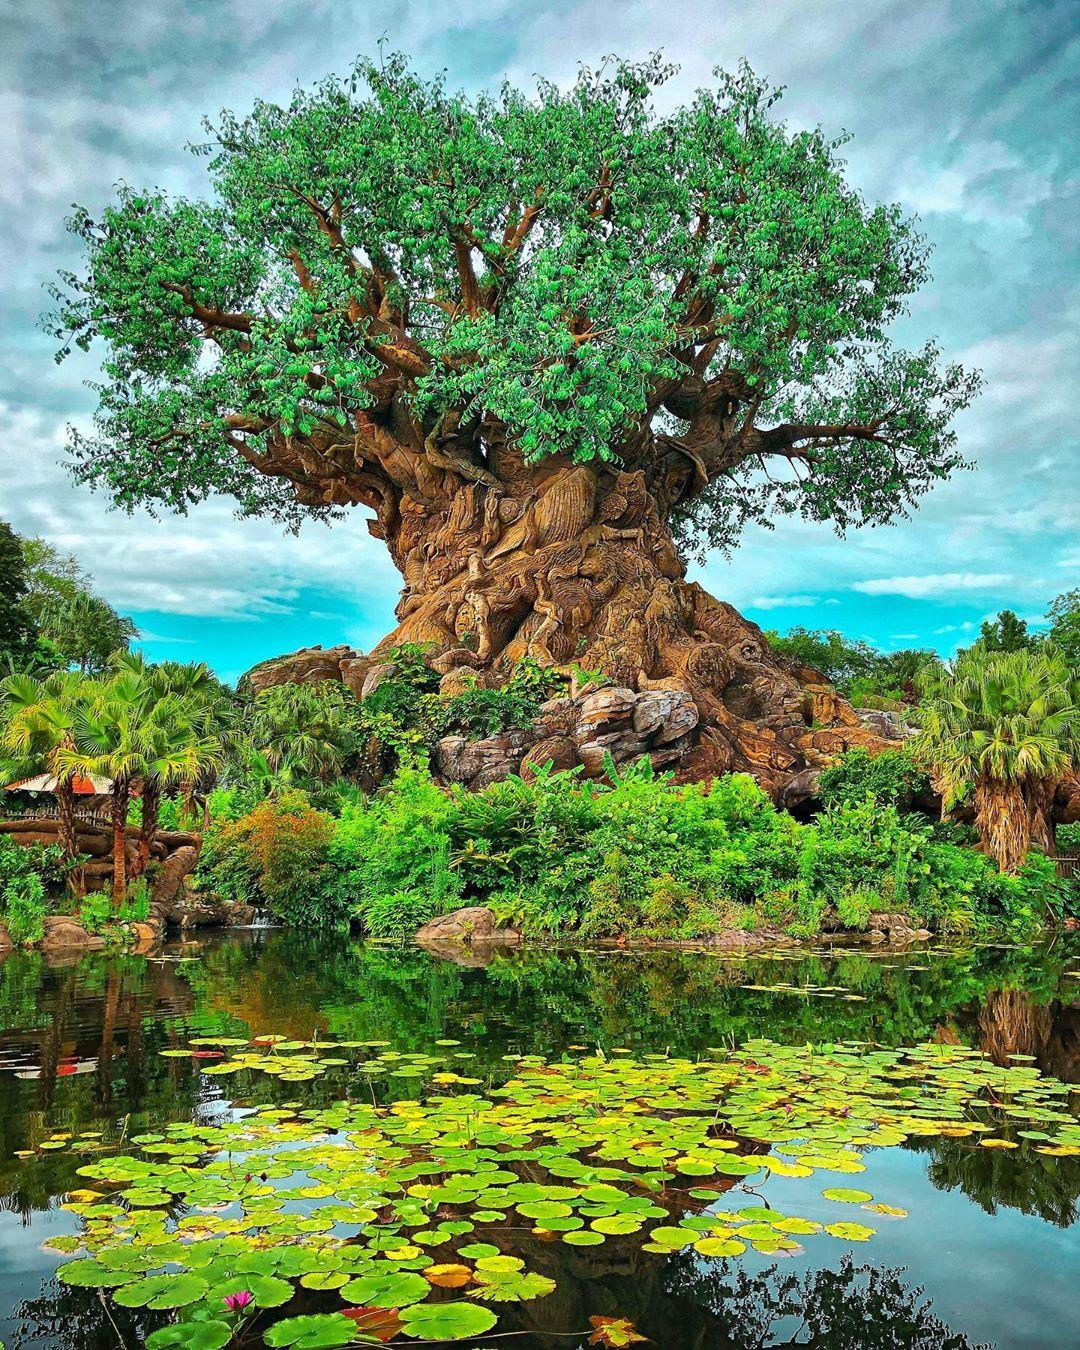 The Tree Of Life Animalkingdom Disneyanimalkingdom Treeoflife Wdw Iphonephotography Iphonepic Iphone Photography Tree Of Life Outdoor